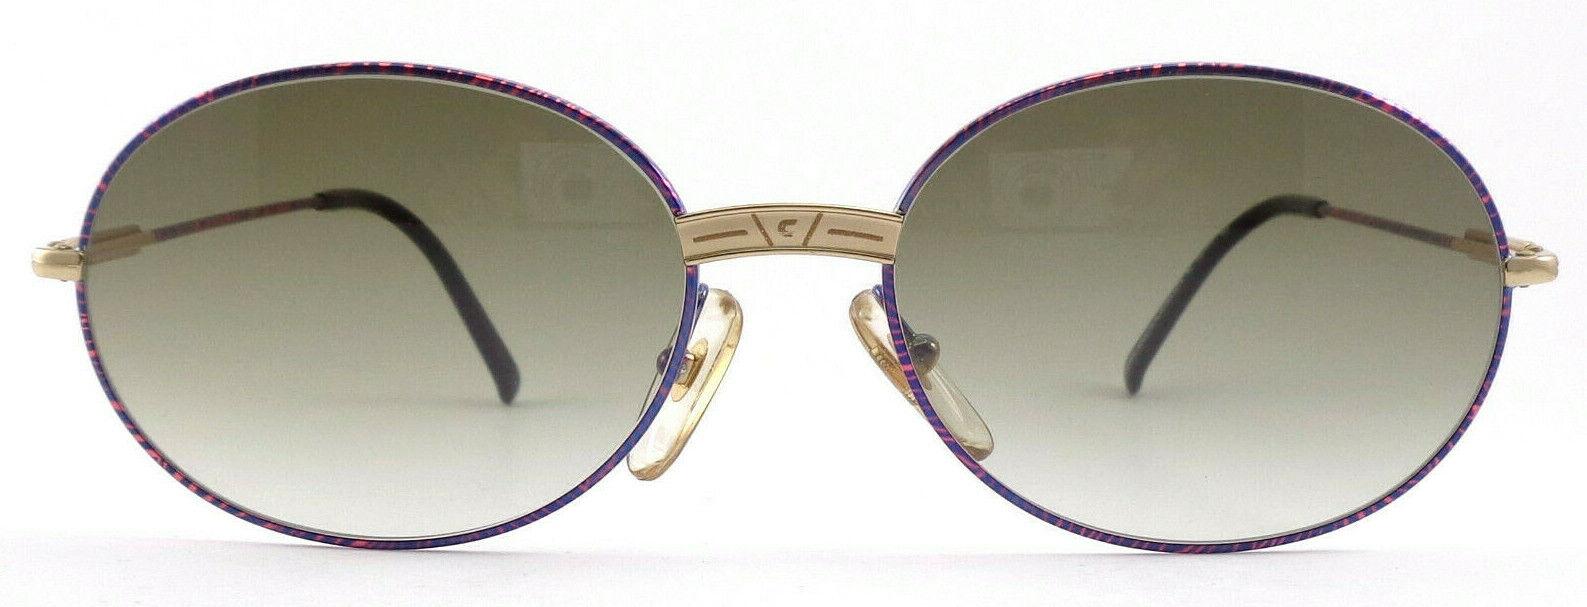 Sunglasses carrera Vintage Woman Model 5374 Color Gold/Purple-show original title